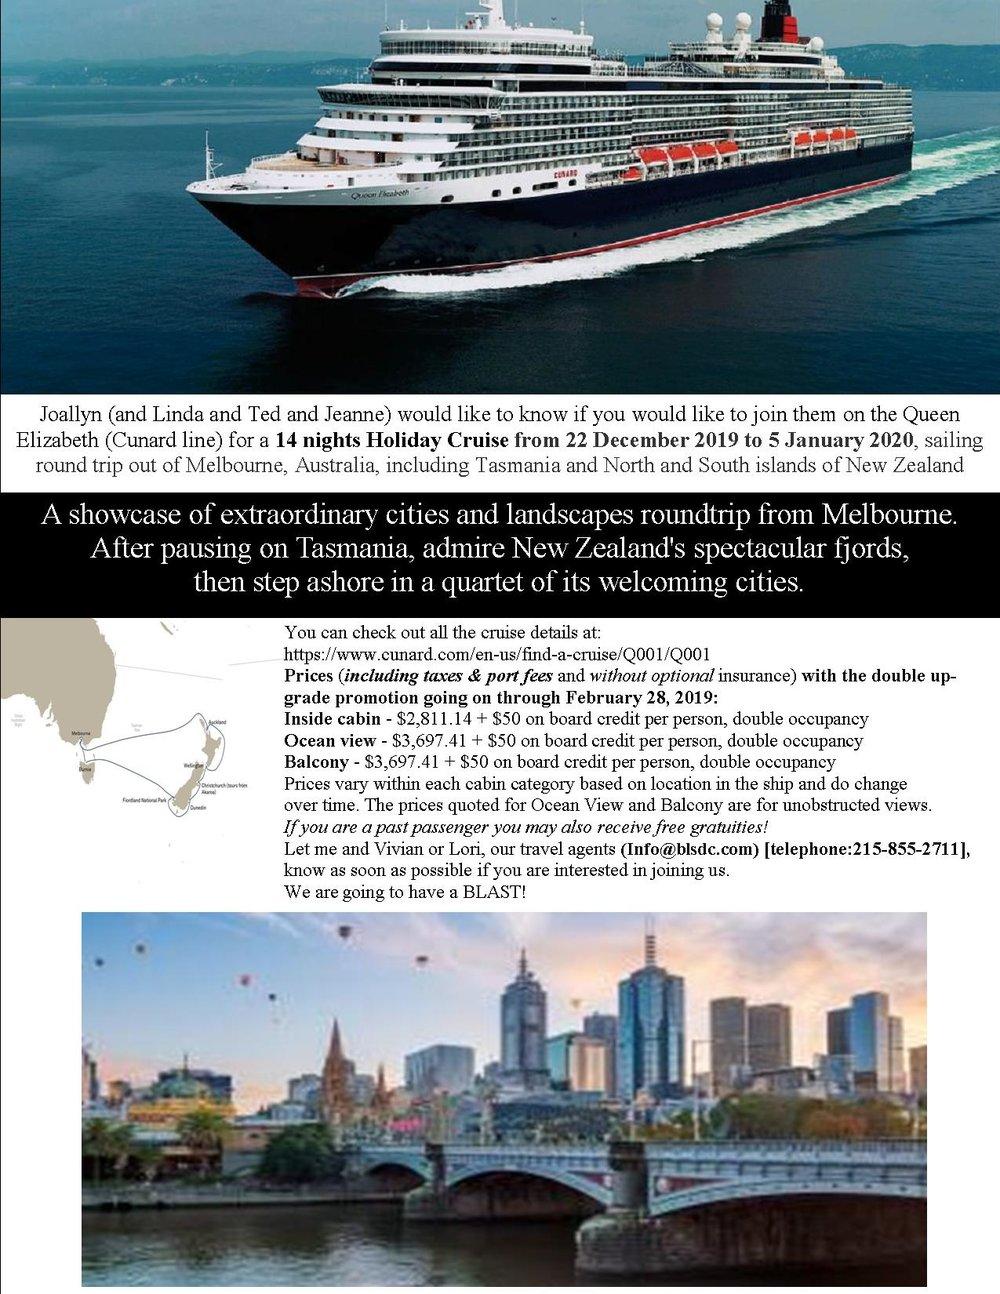 2019 Queen Elizabeth Holiday New Zealand Cruise flier.jpg